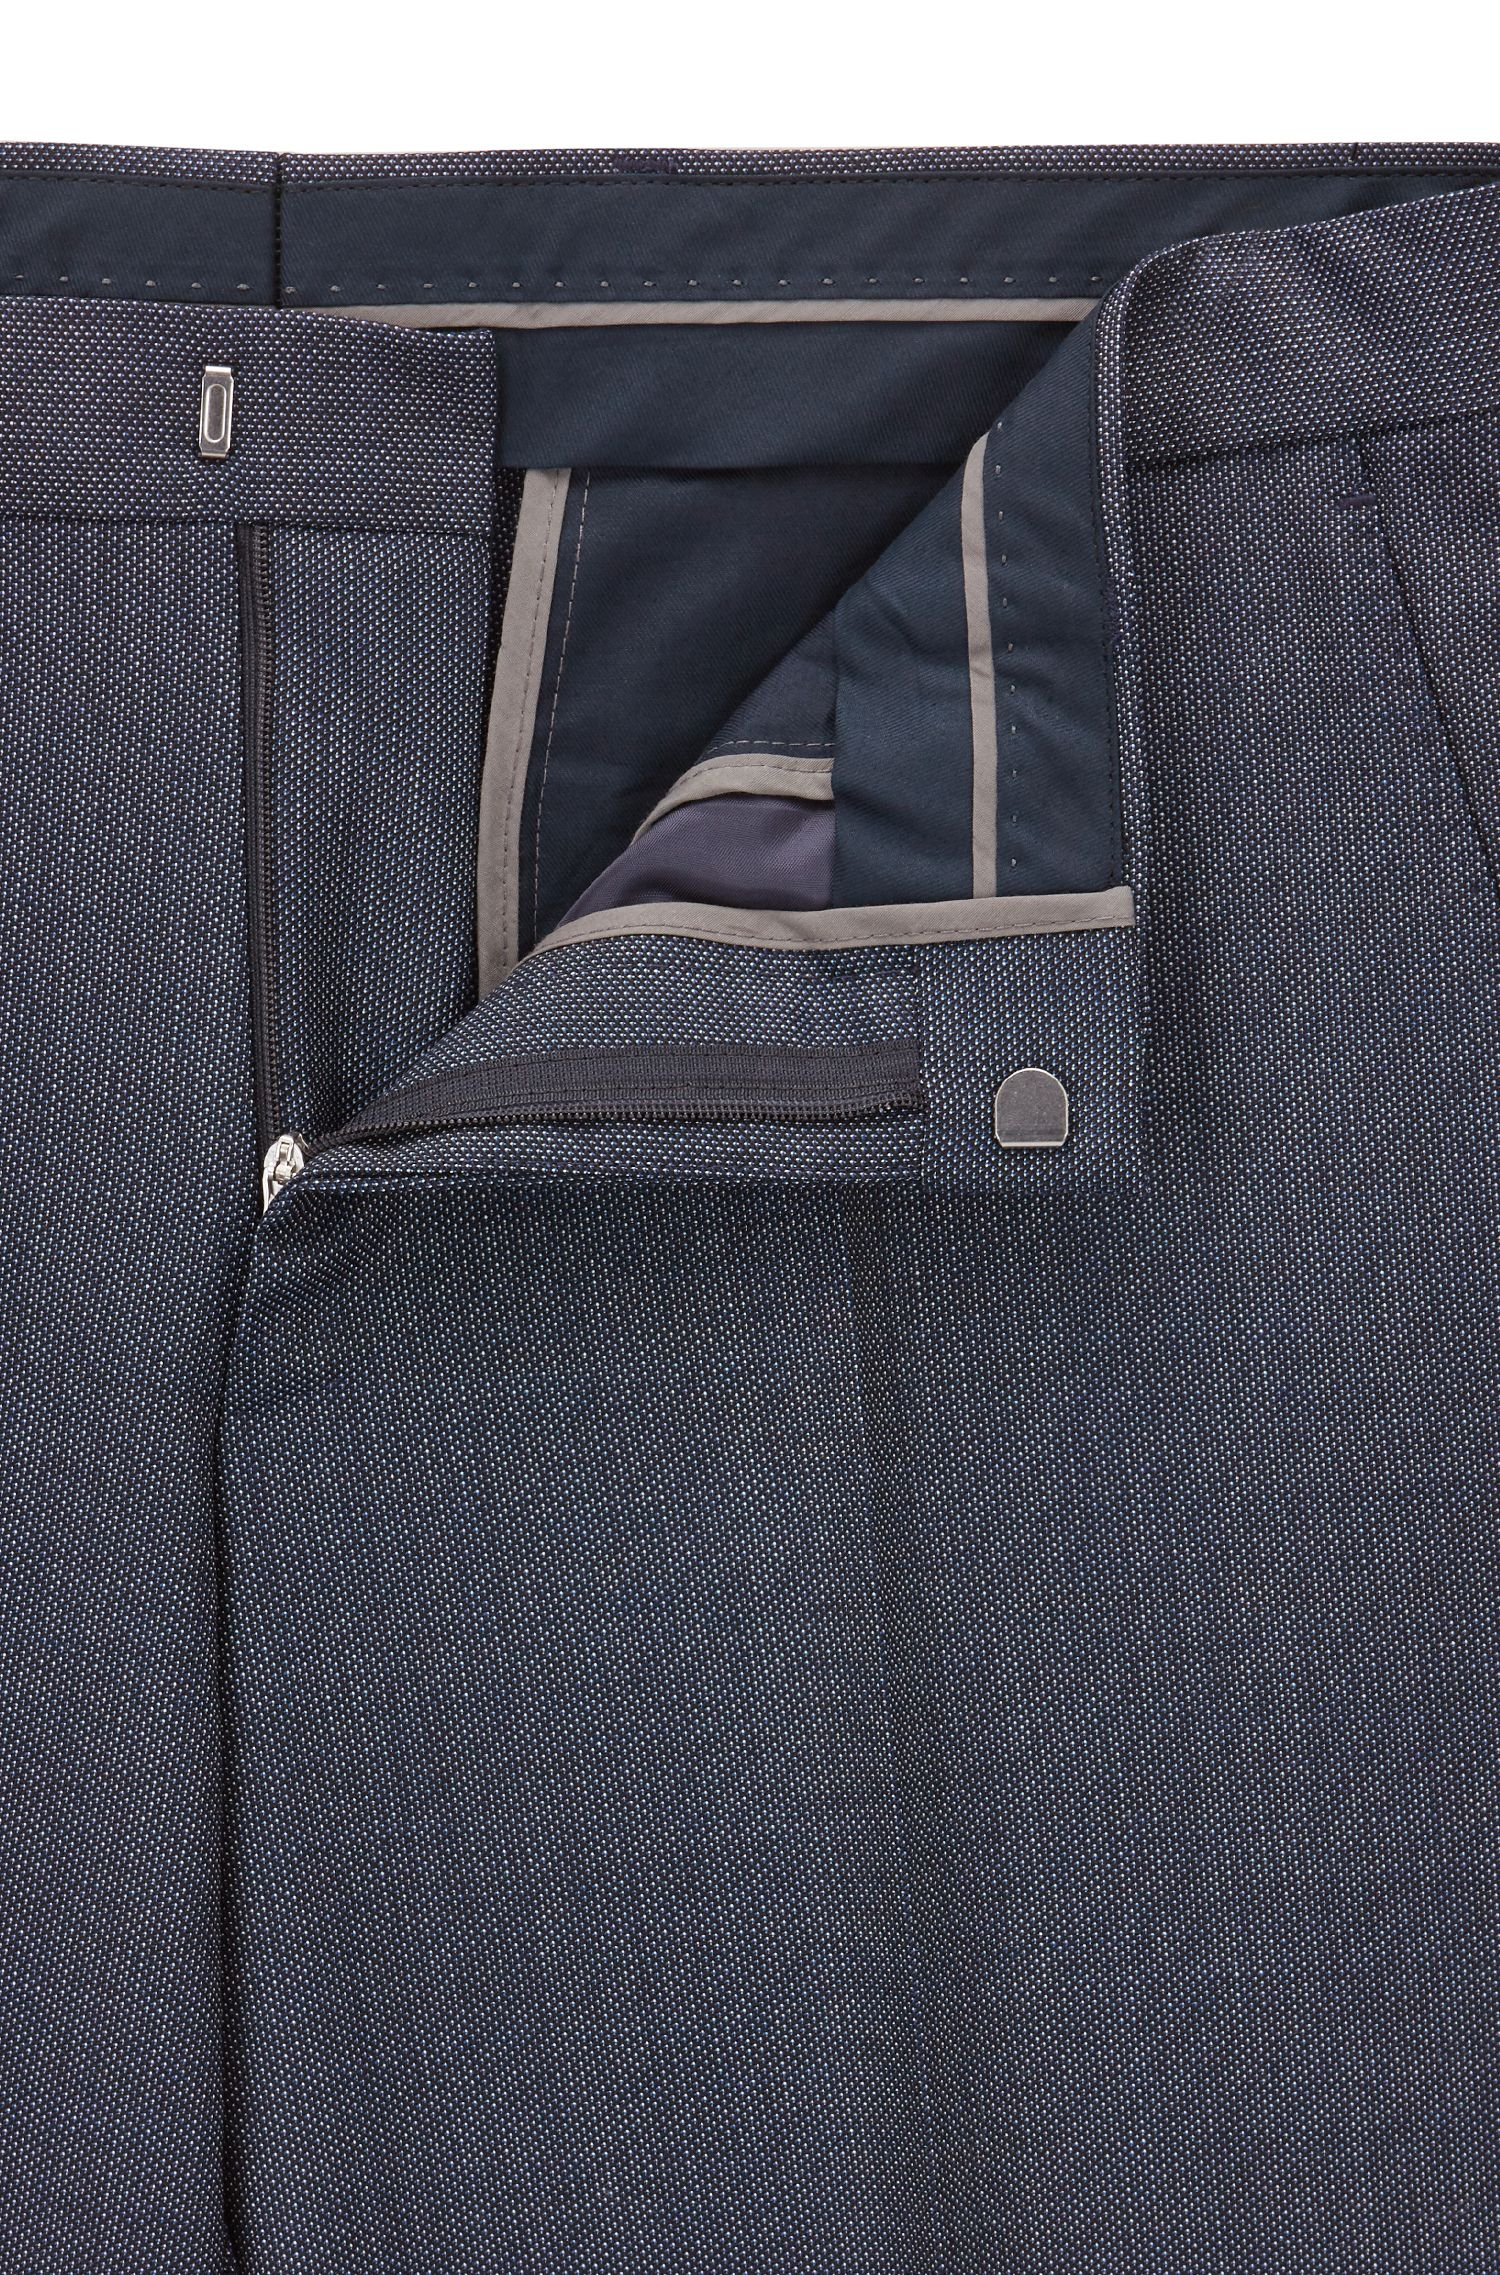 Abito slim fit in serge di lana vergine con microdisegni, Blu